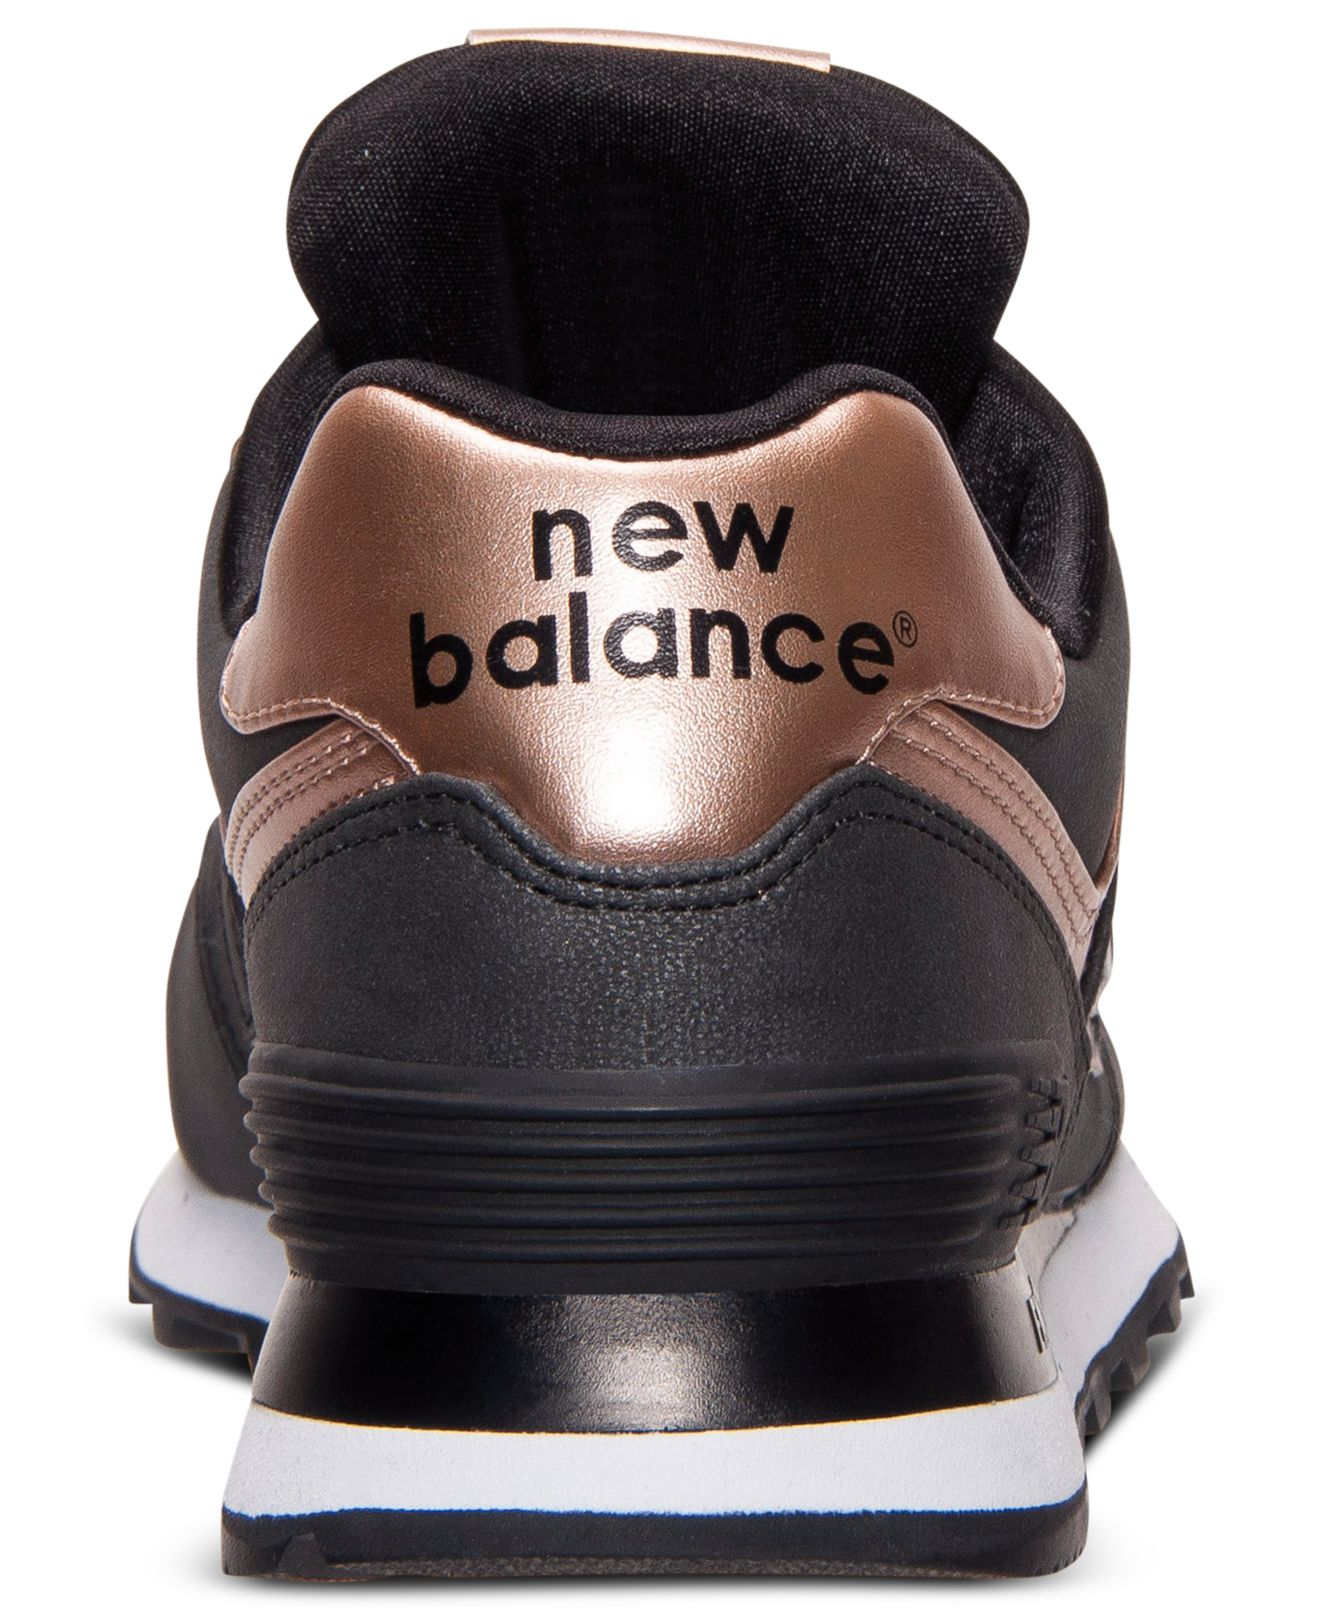 new balance 373 femme noir et rose gold